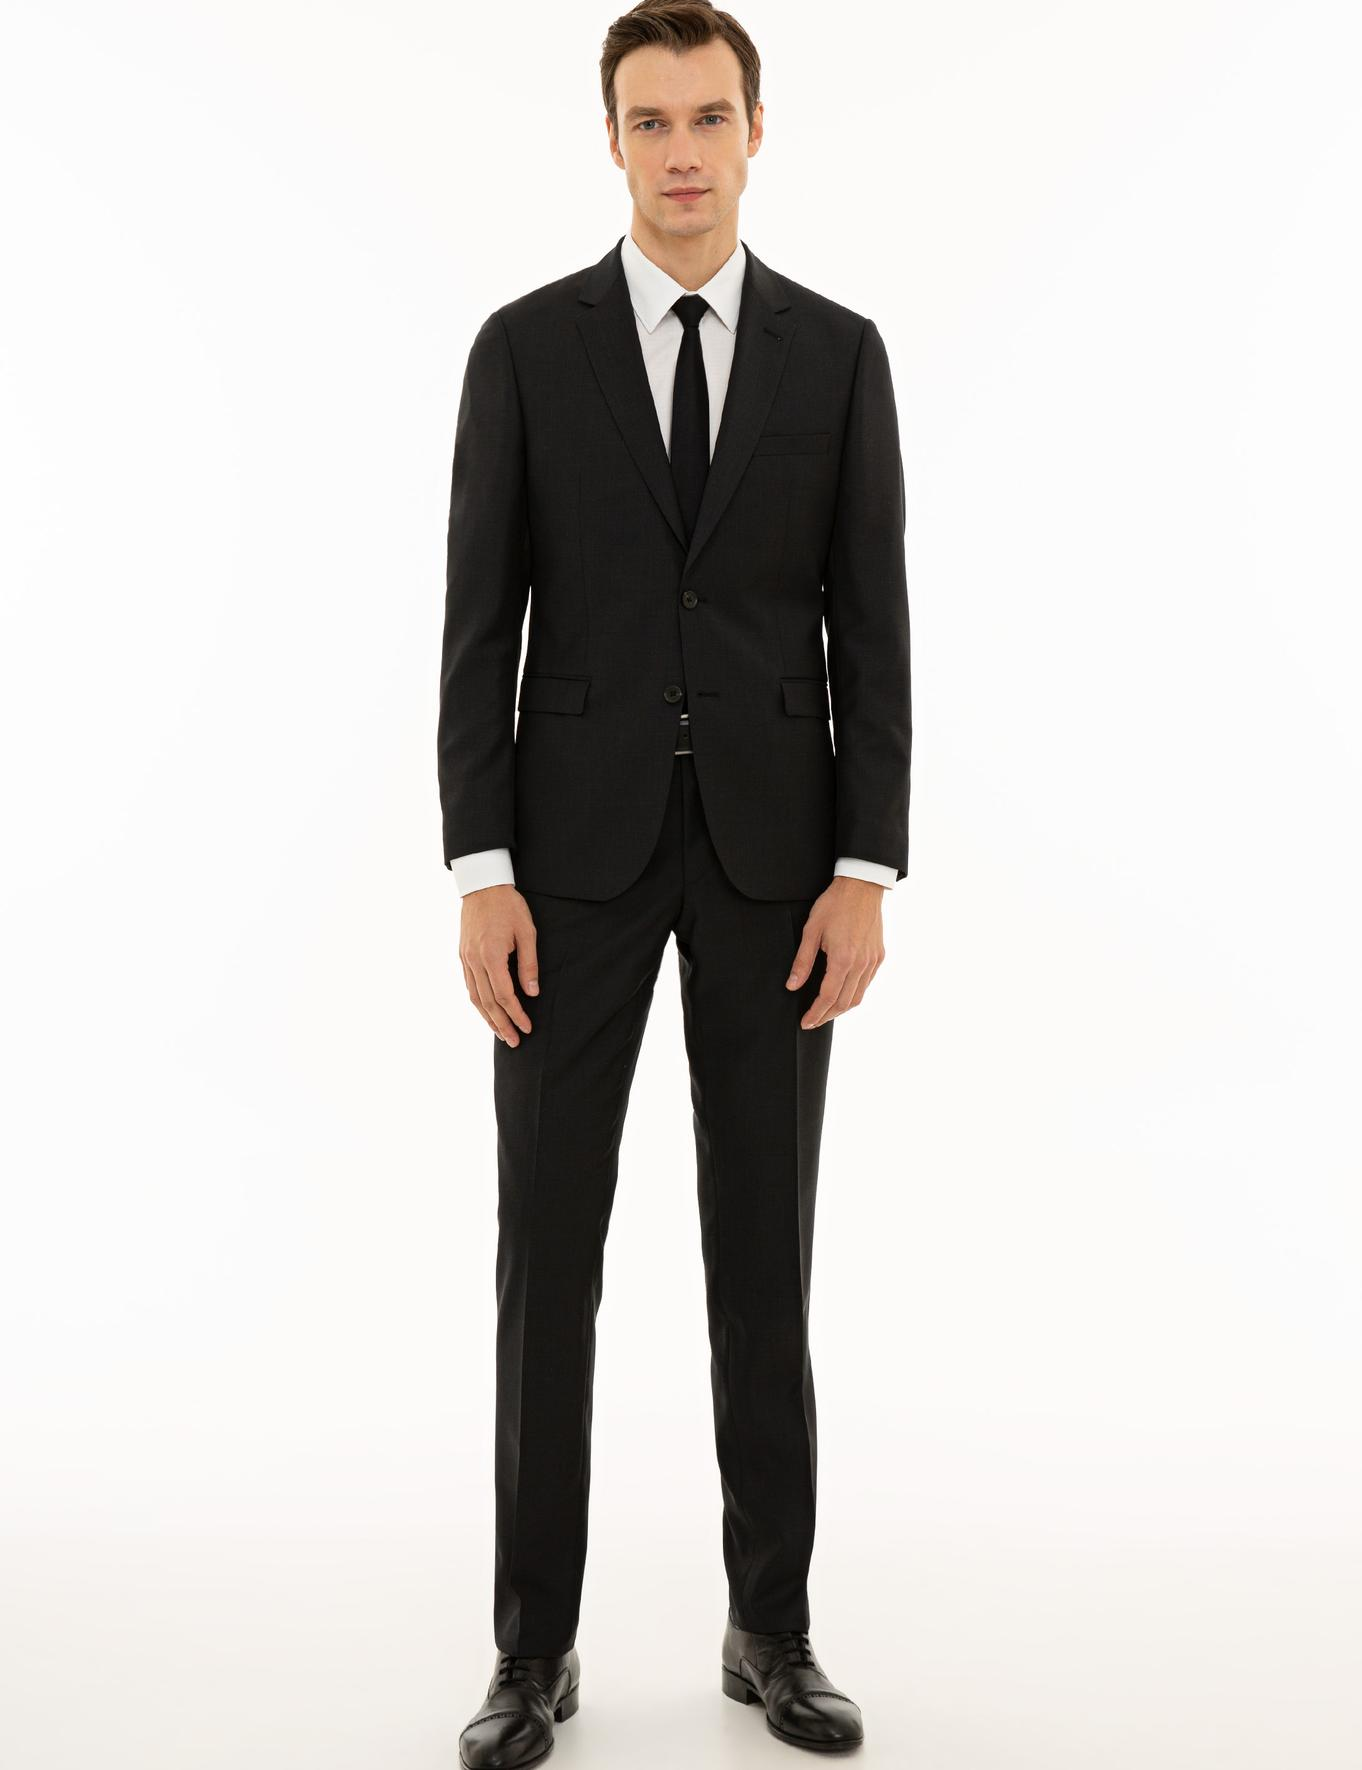 Antrasit Slim Fit Takım Elbise - 50231765008